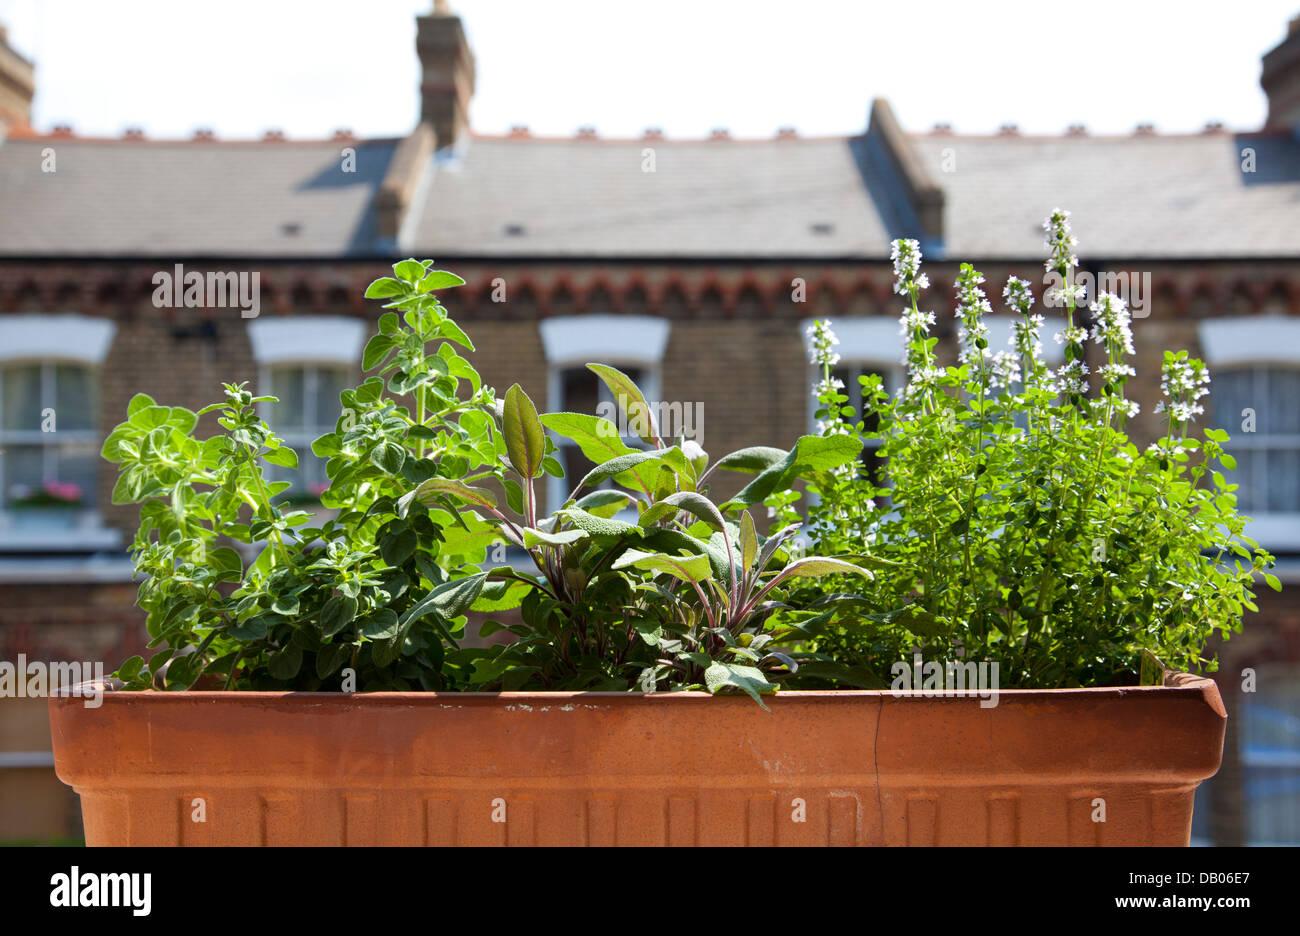 Oregano, Sage and Lemon Thyme growing in Window Box of London Home - UK - Stock Image